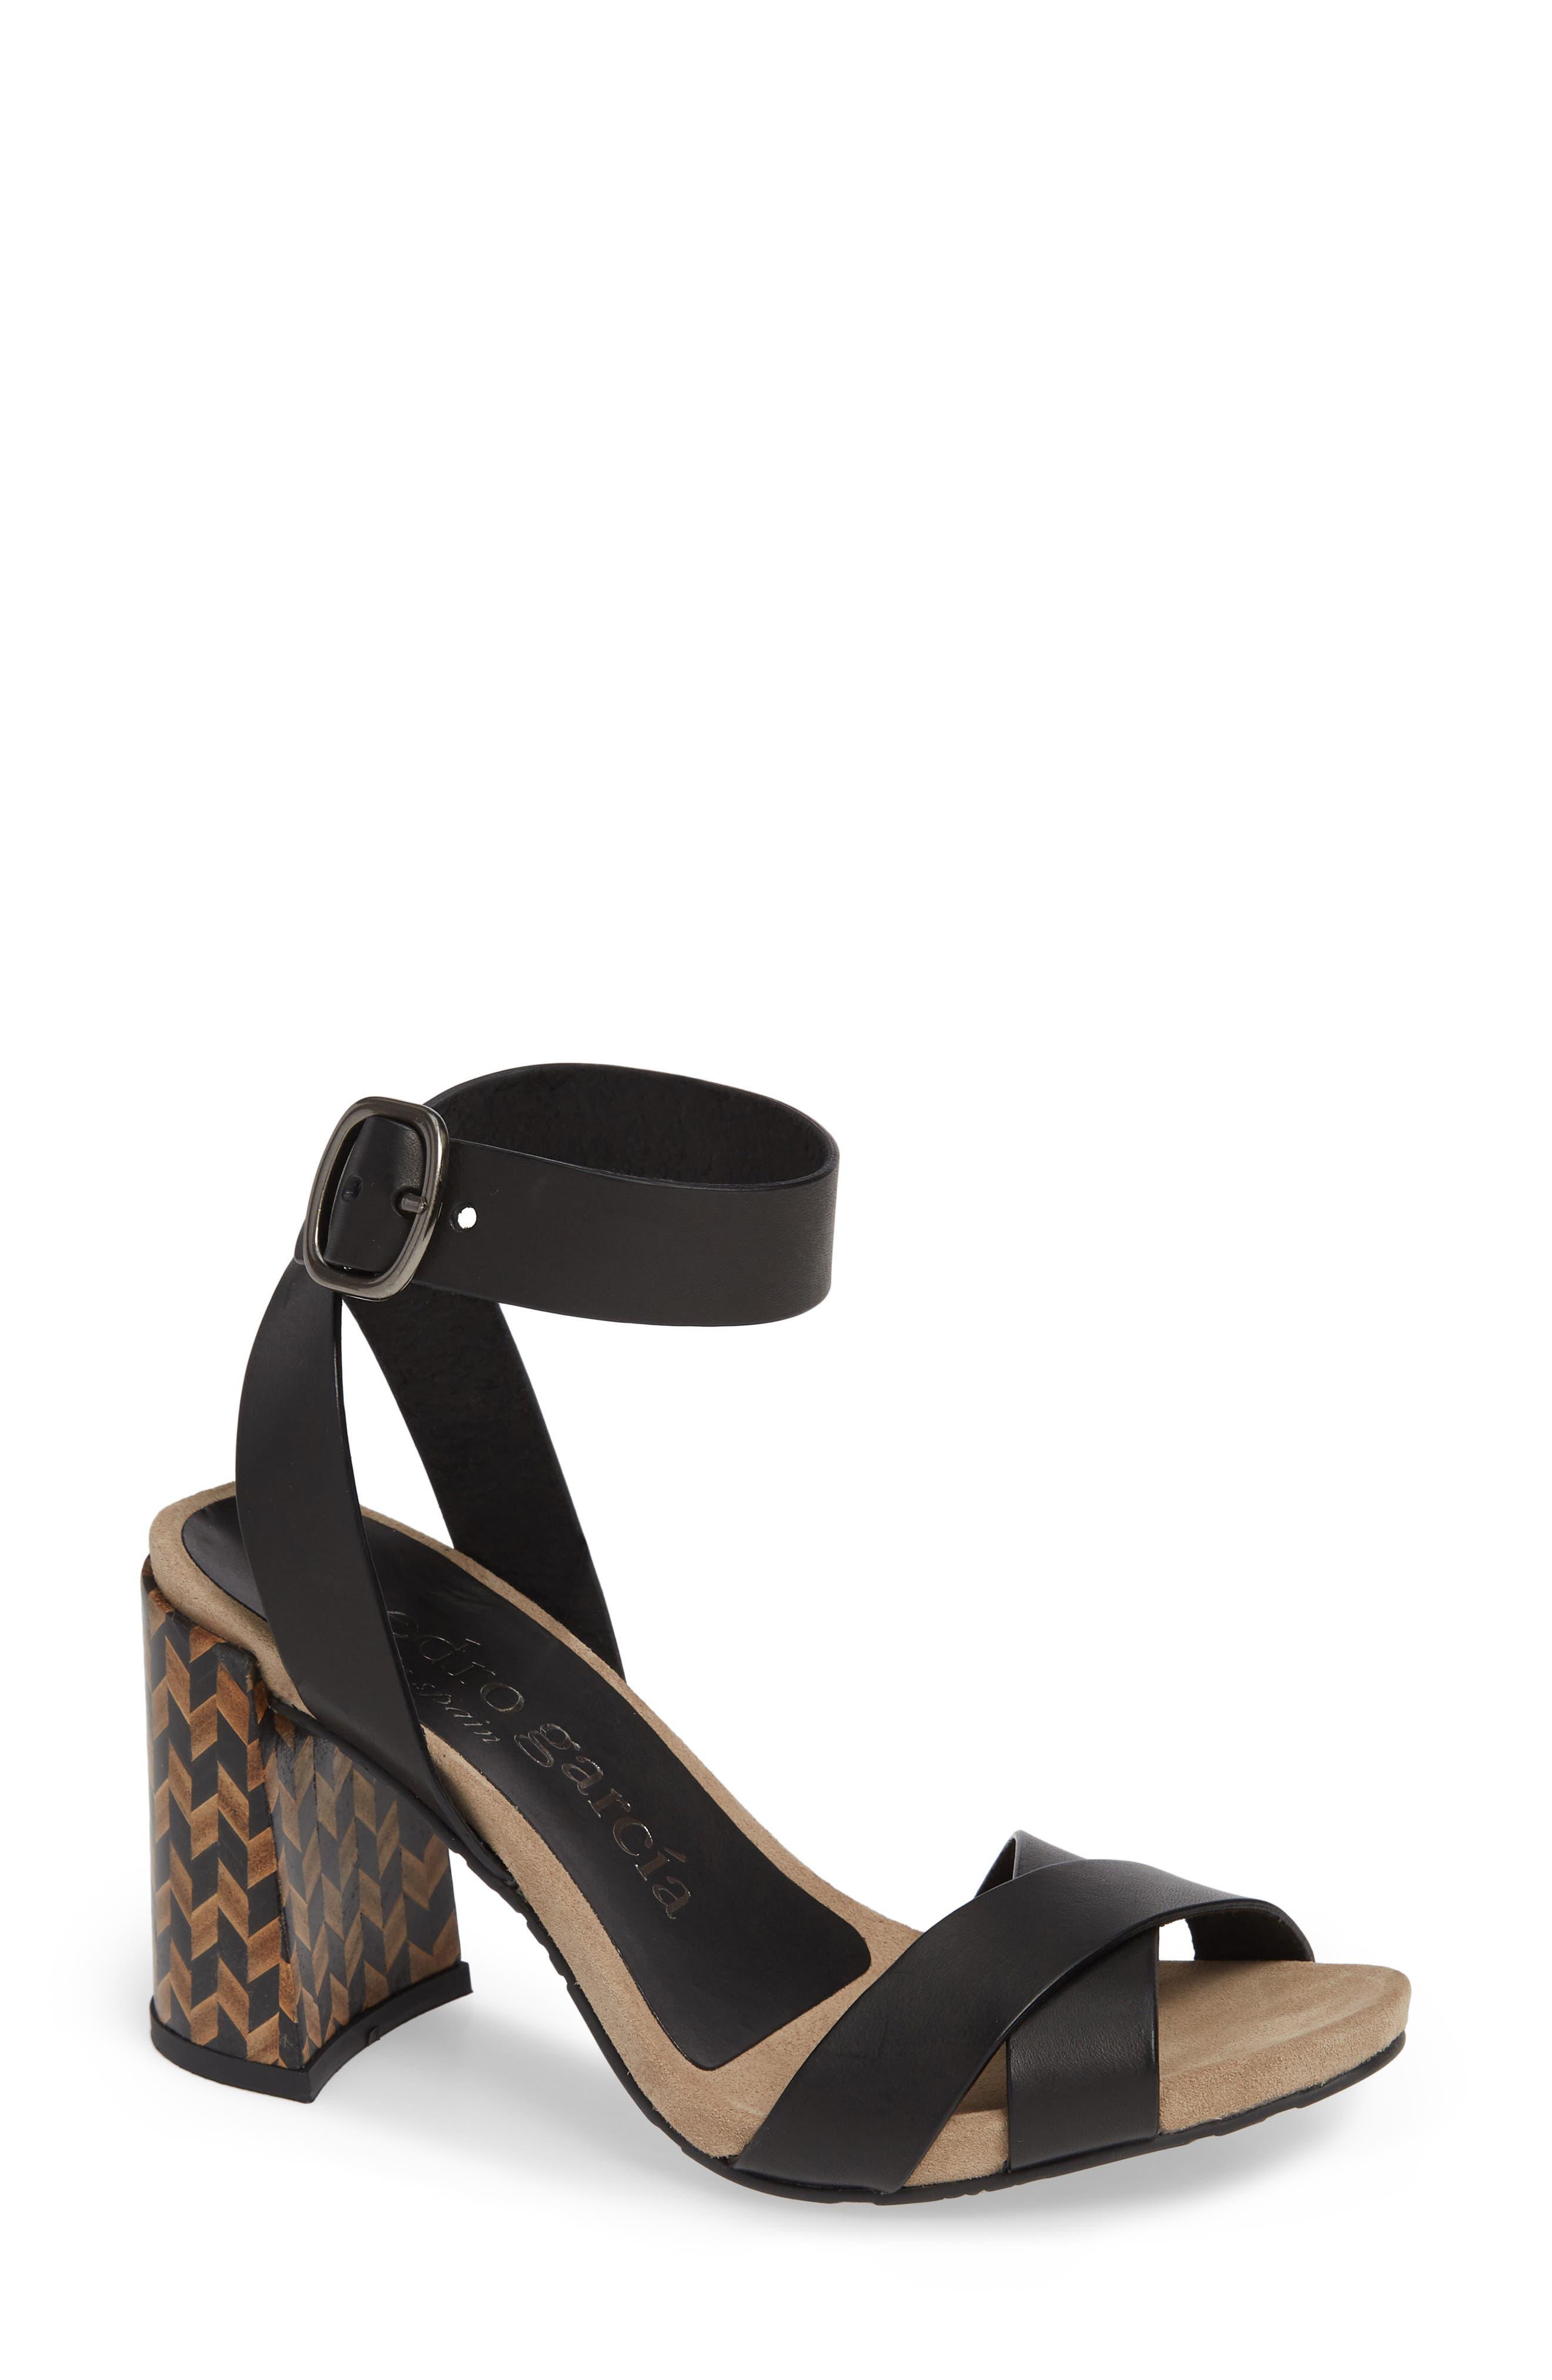 Yemba Embellished Heel Sandal,                             Main thumbnail 1, color,                             BLACK VACCHETTA